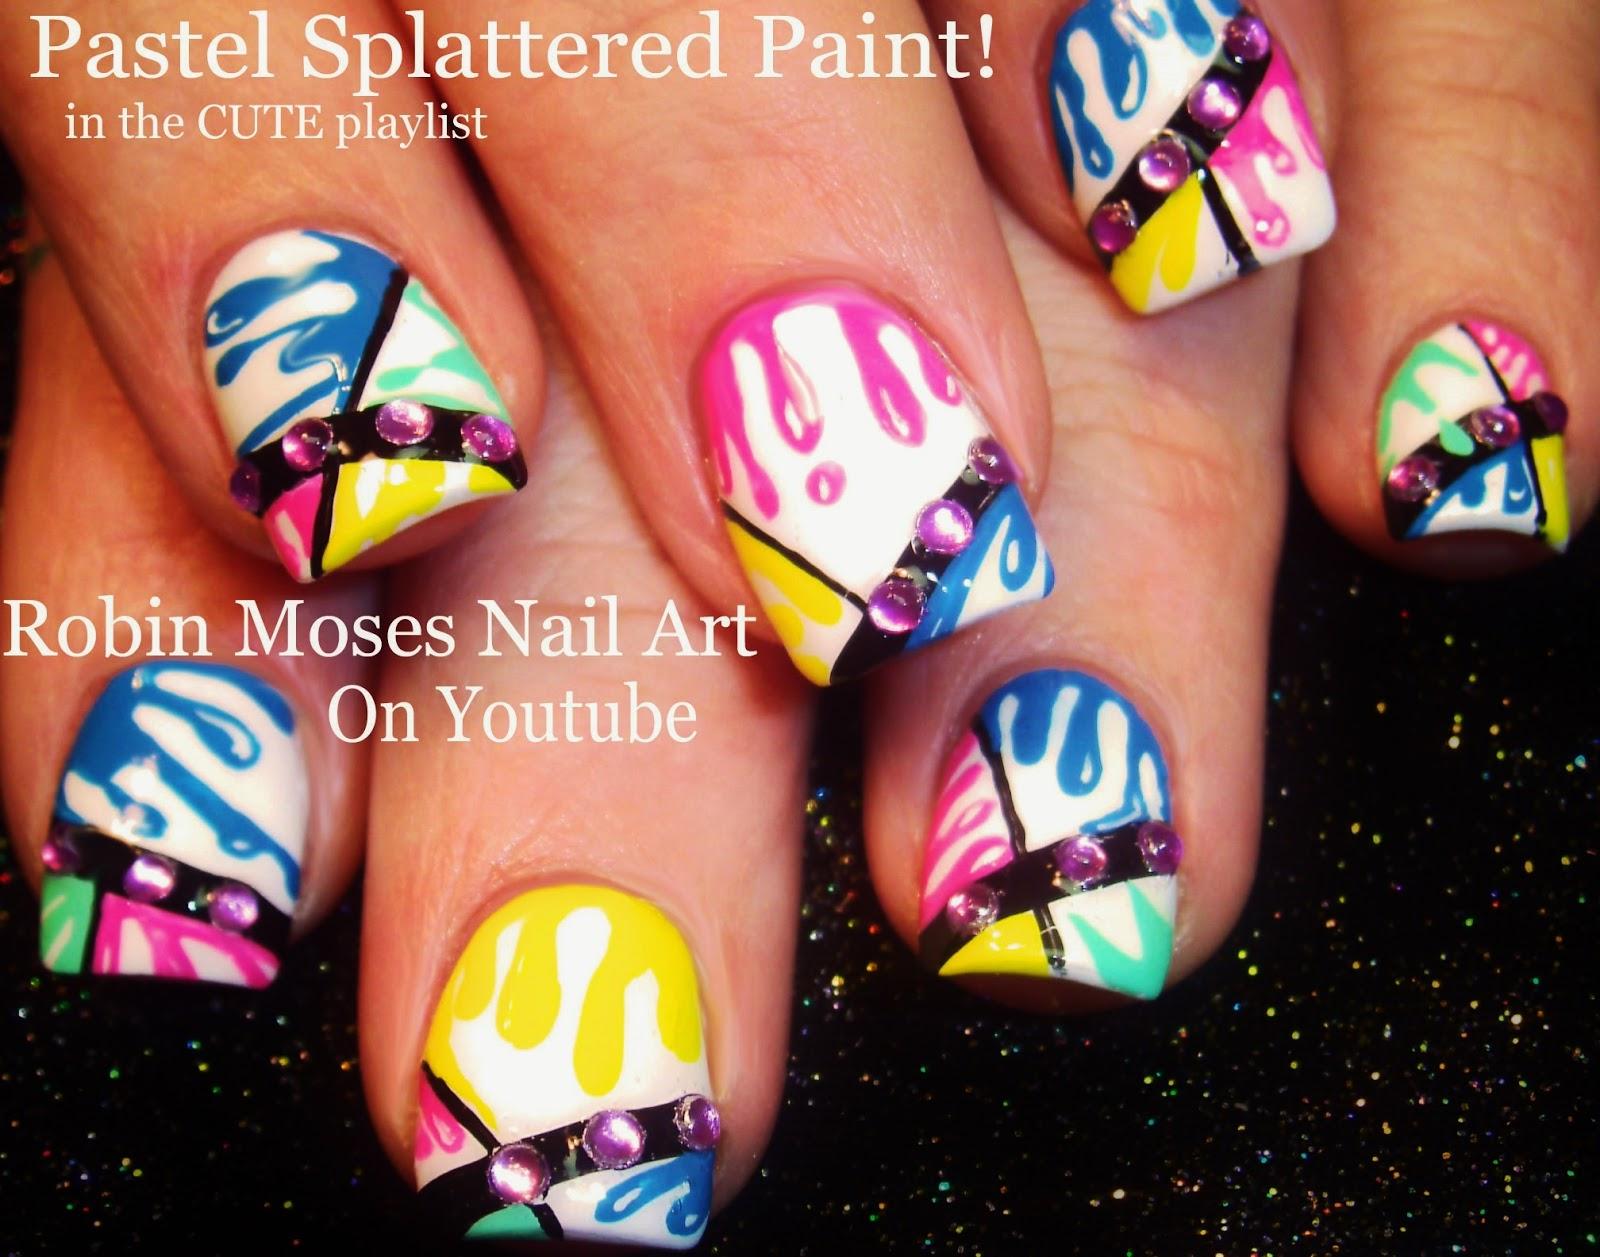 Robin moses nail art color dripping nail design splatterpaint nail art pastel splatter paint nails fun color dripping nail design prinsesfo Choice Image